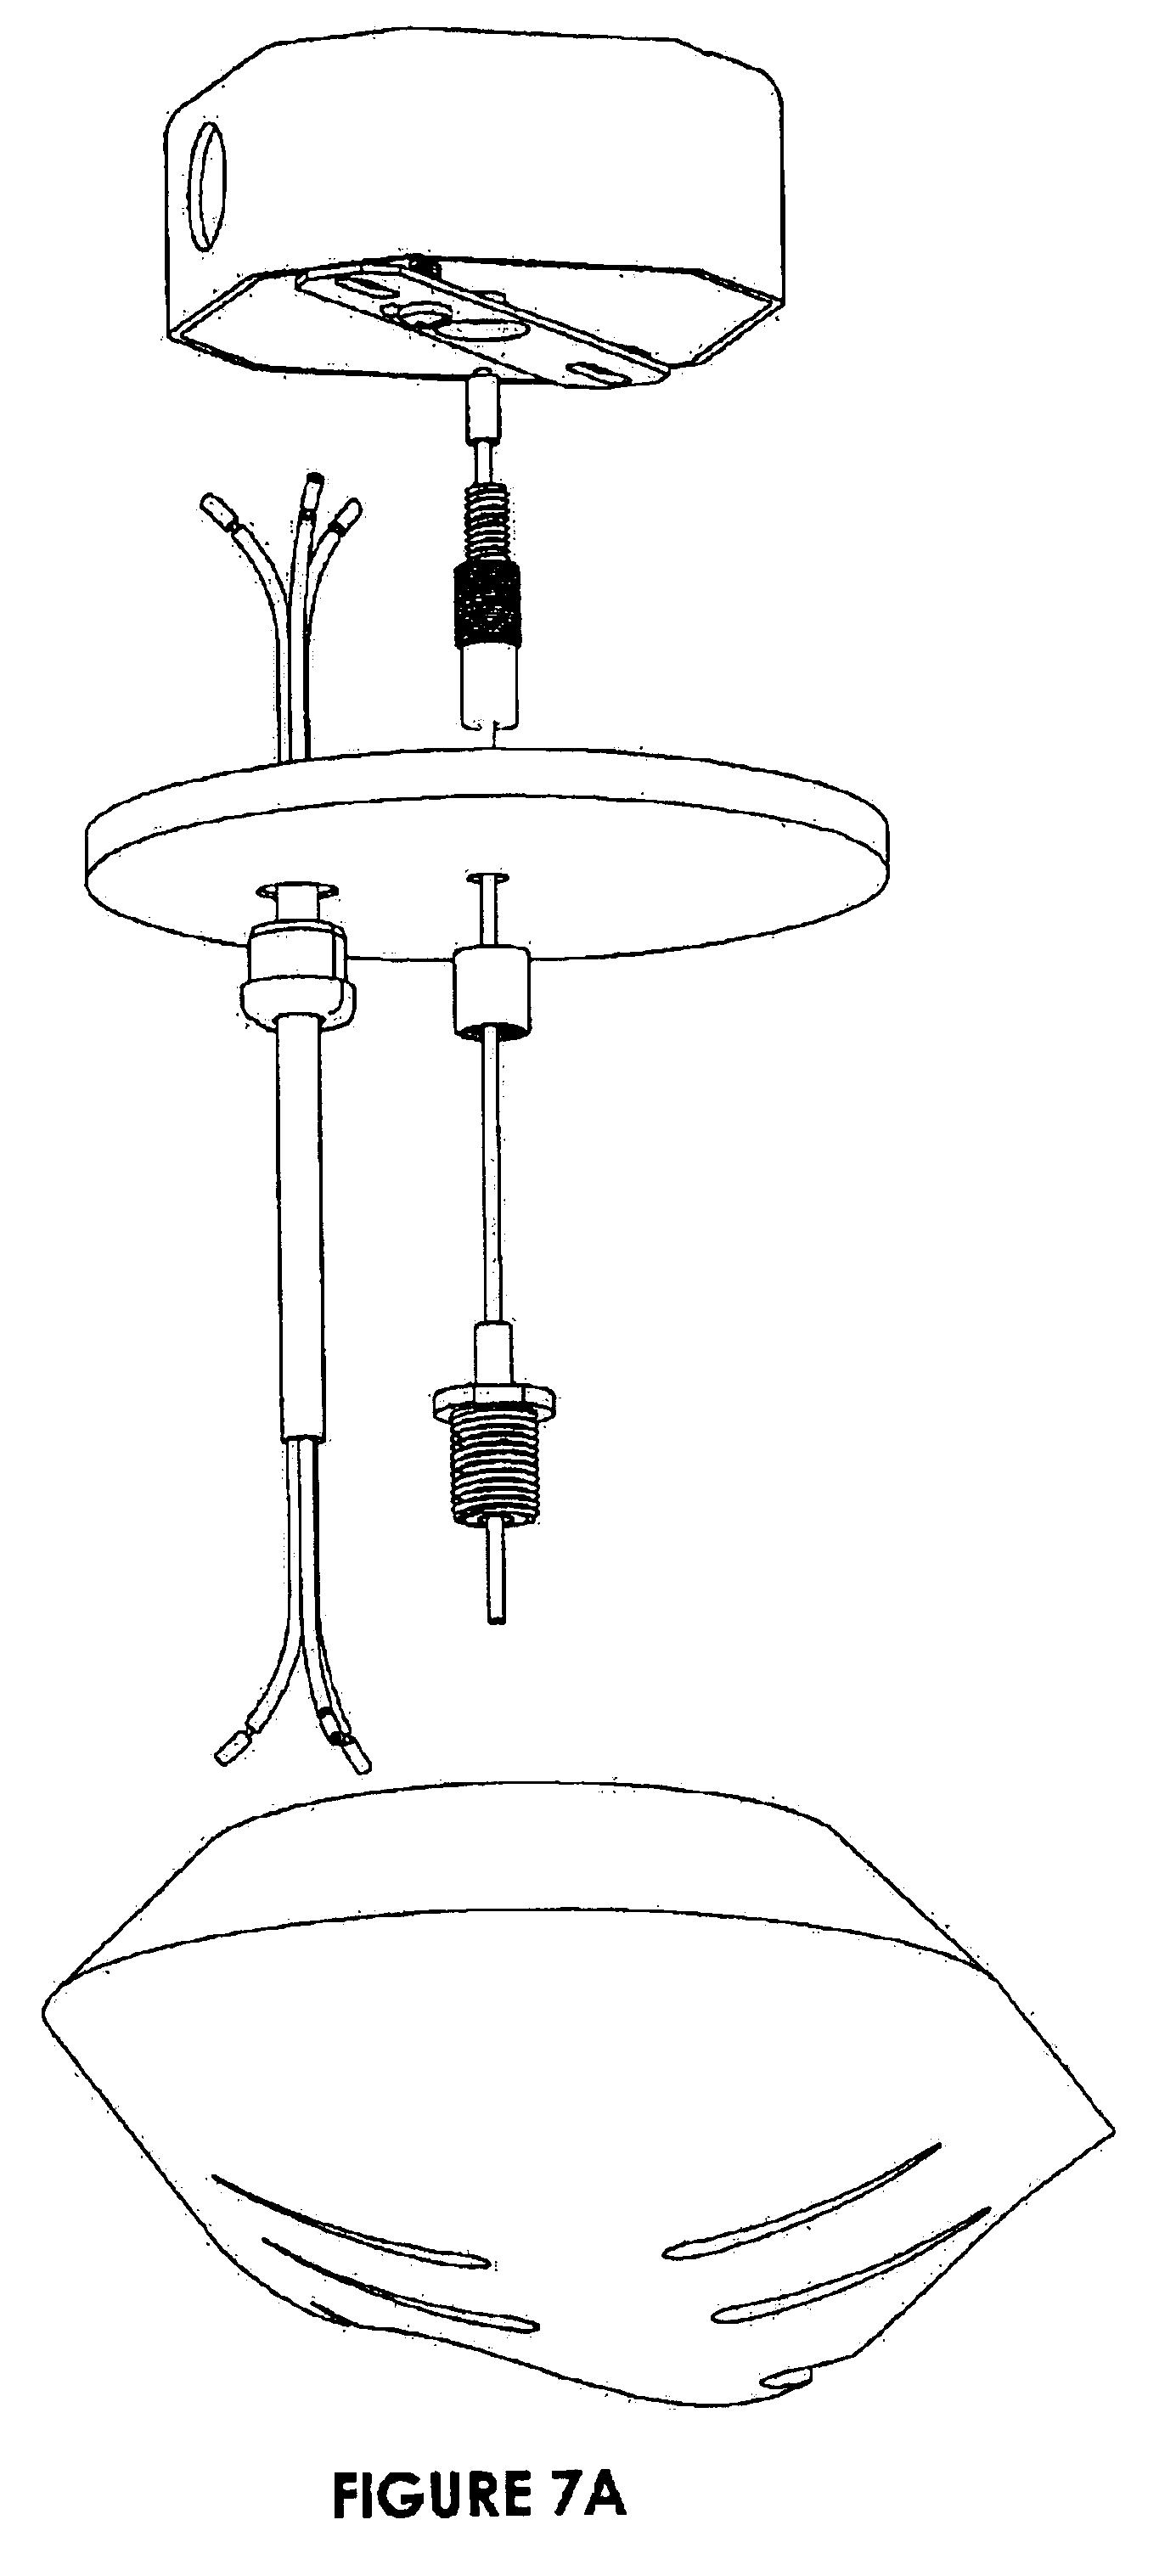 emg wiring code wiring diagram database Mobile Home Breaker Box Diagram original emg wiring diagram solder emg p bass wiring diagram emg wiring code